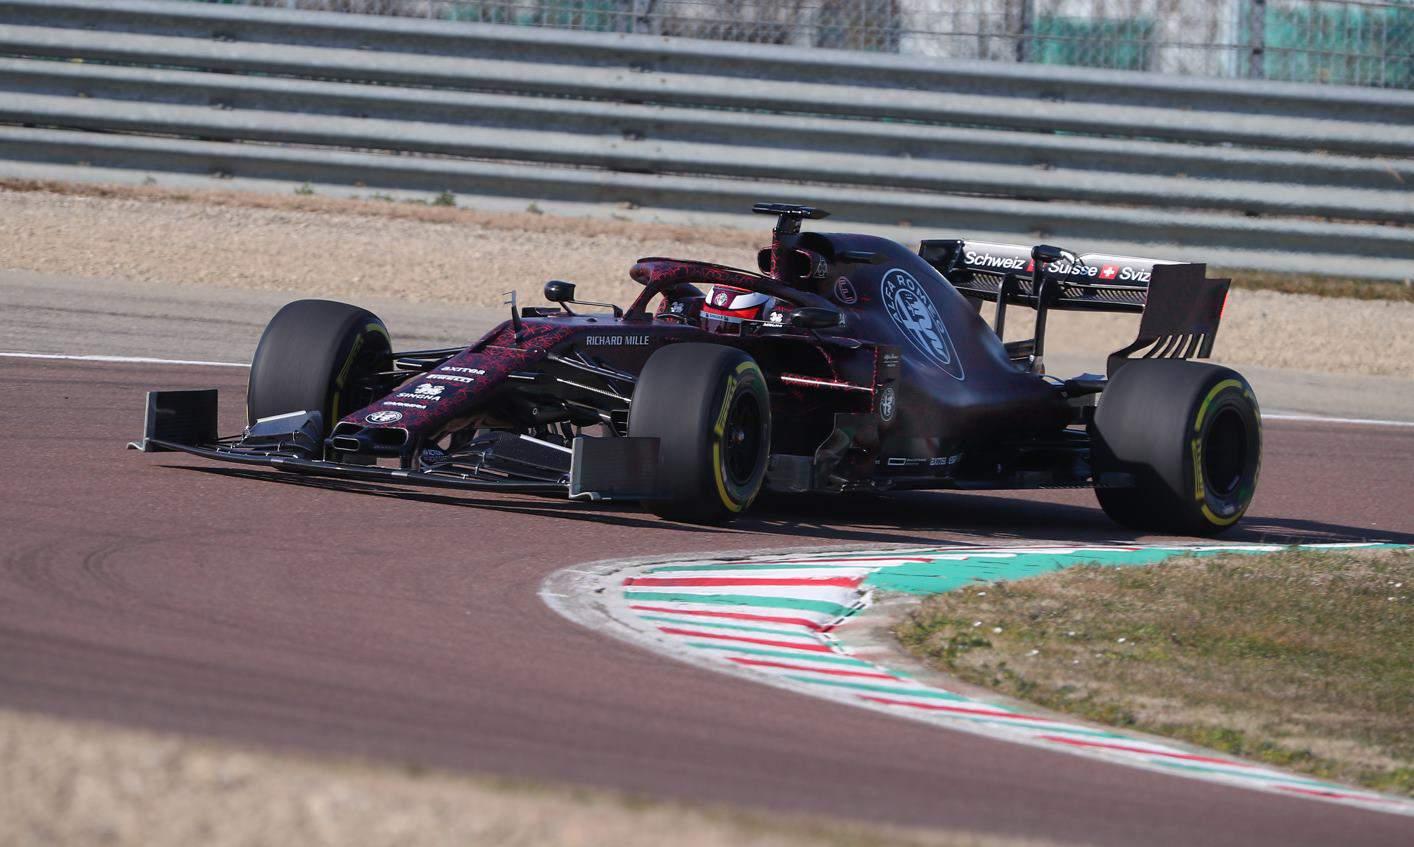 Alfa Romeo Test Their New 2019 F1 Car At Fiorano